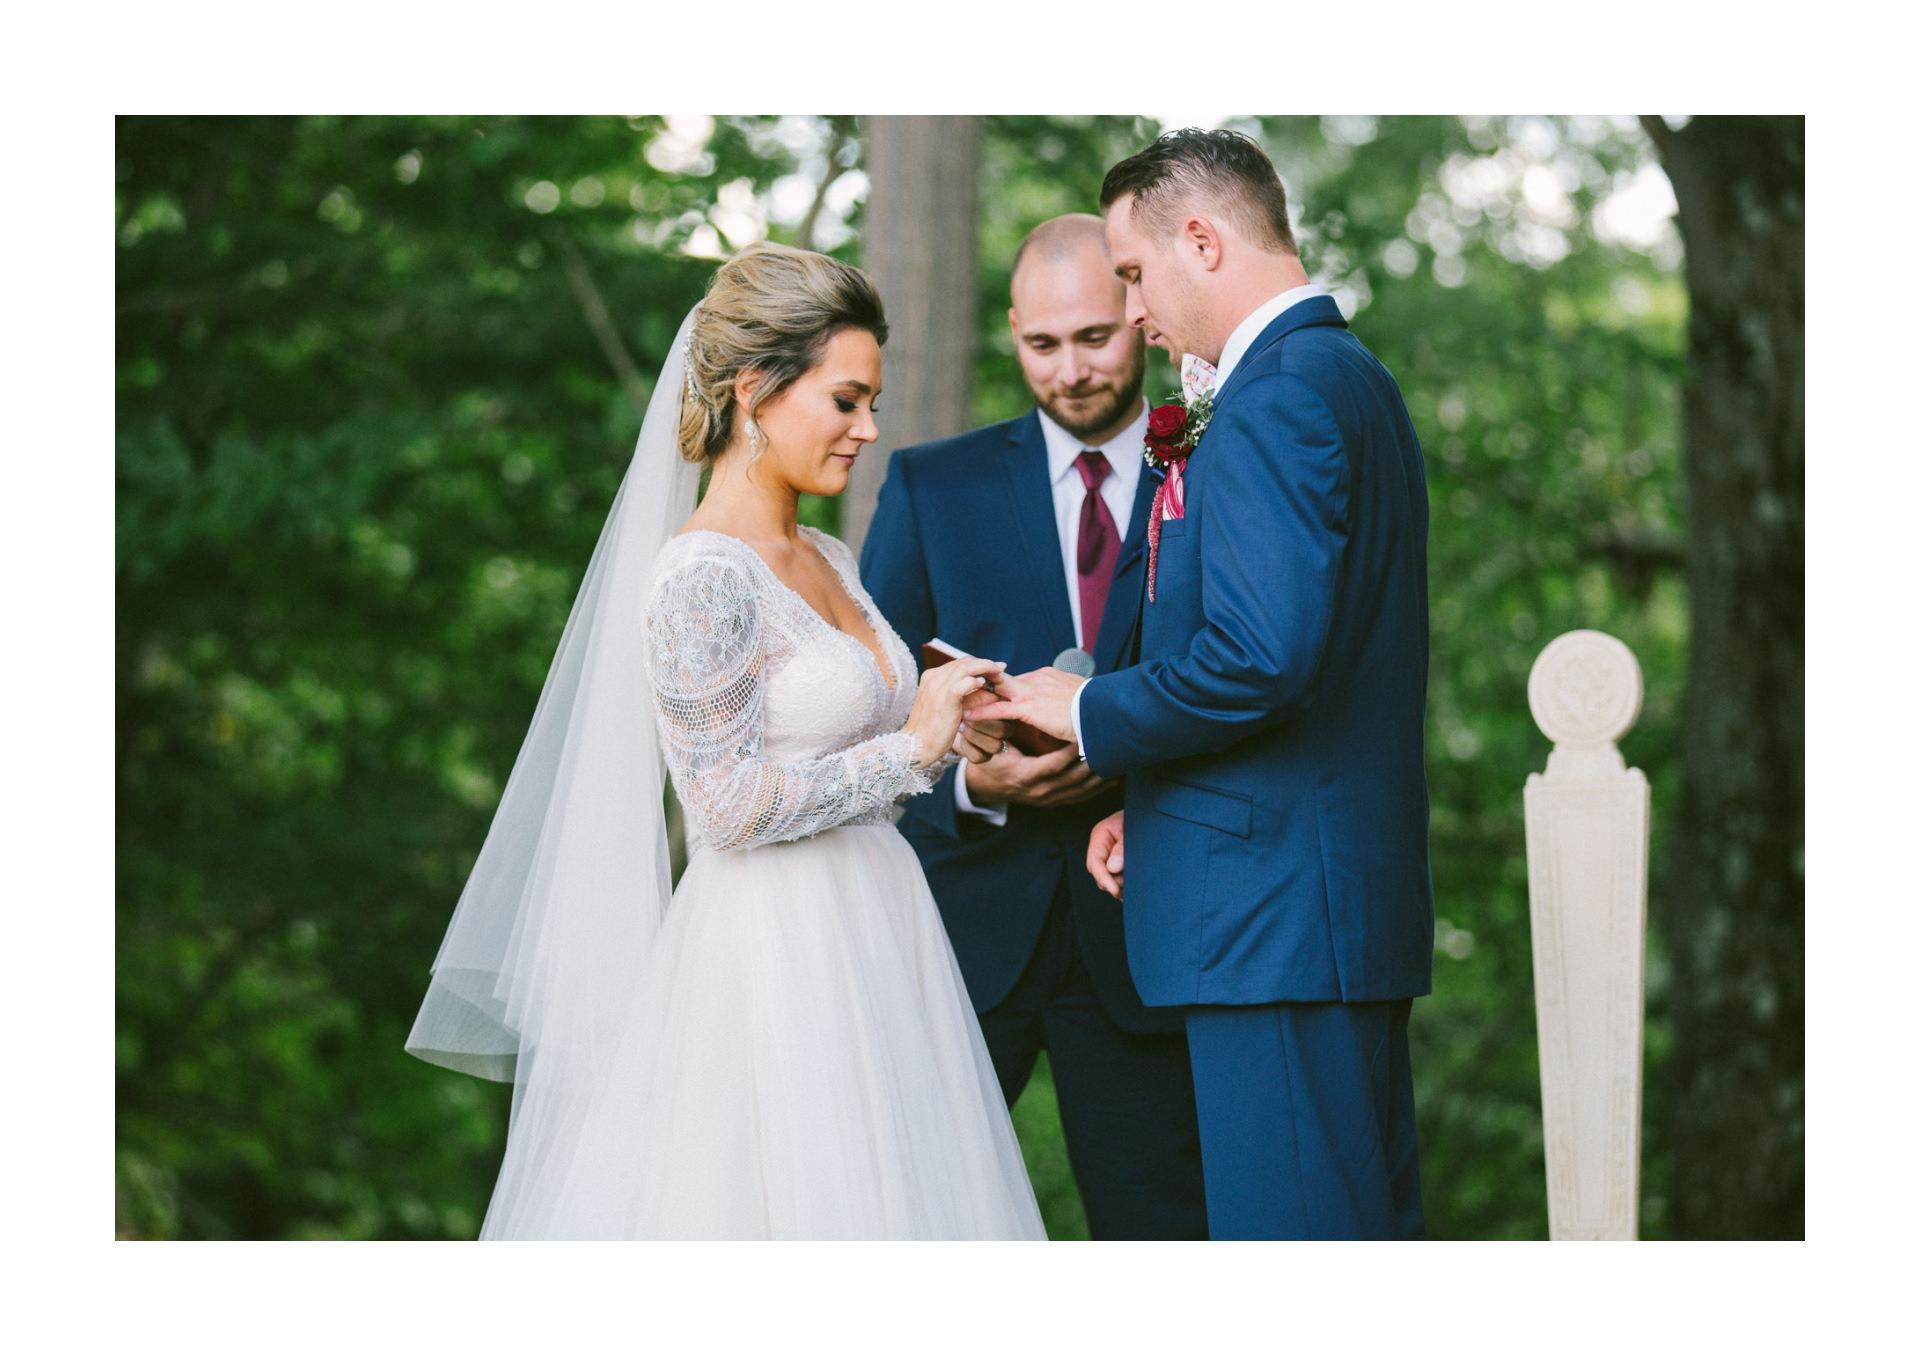 Meadow Ridge Farm Wedding Photos in Windsor 2 30.jpg